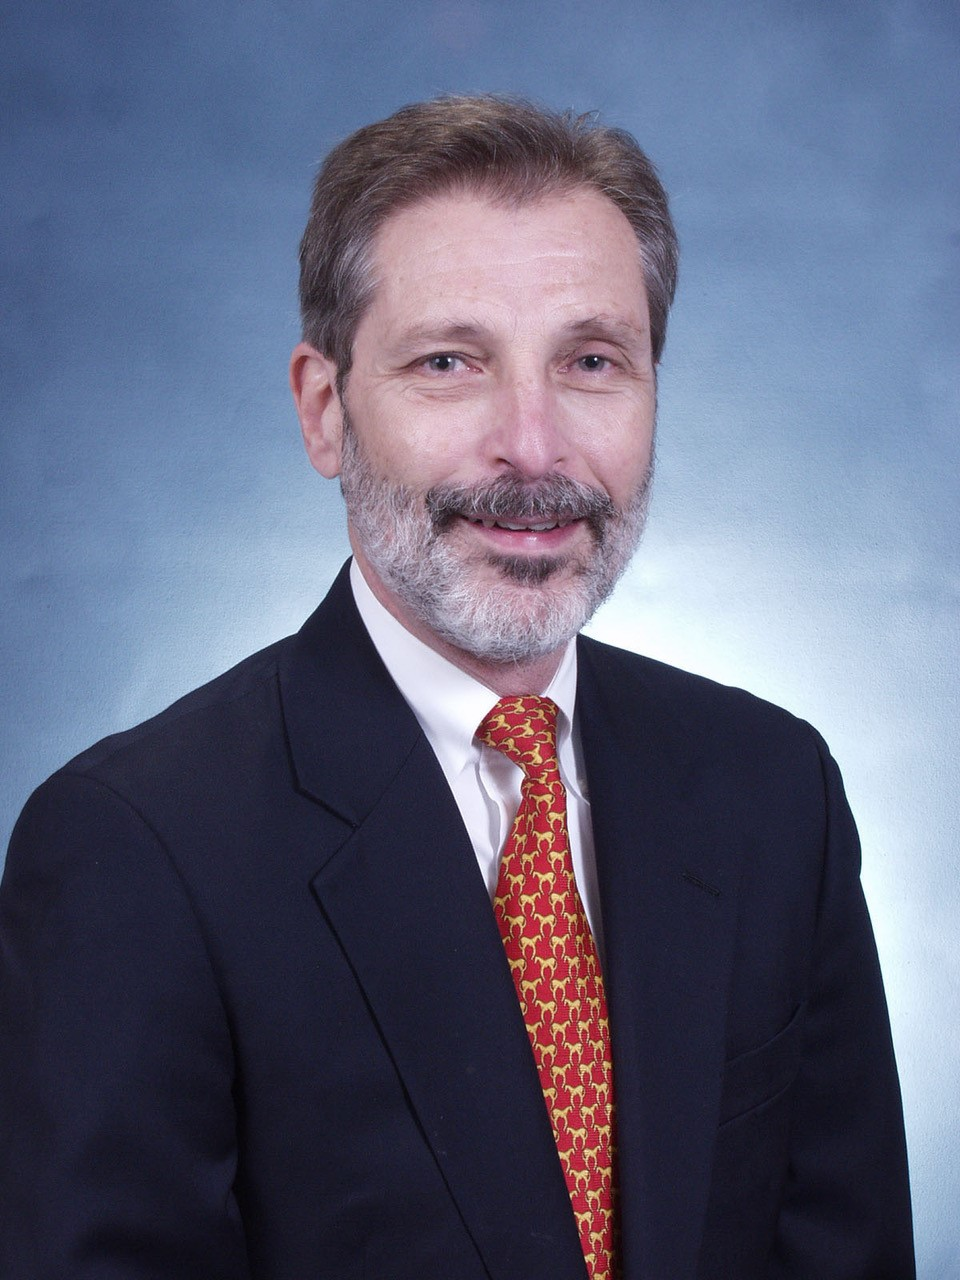 William R. Lovallo, University of Oklahoma